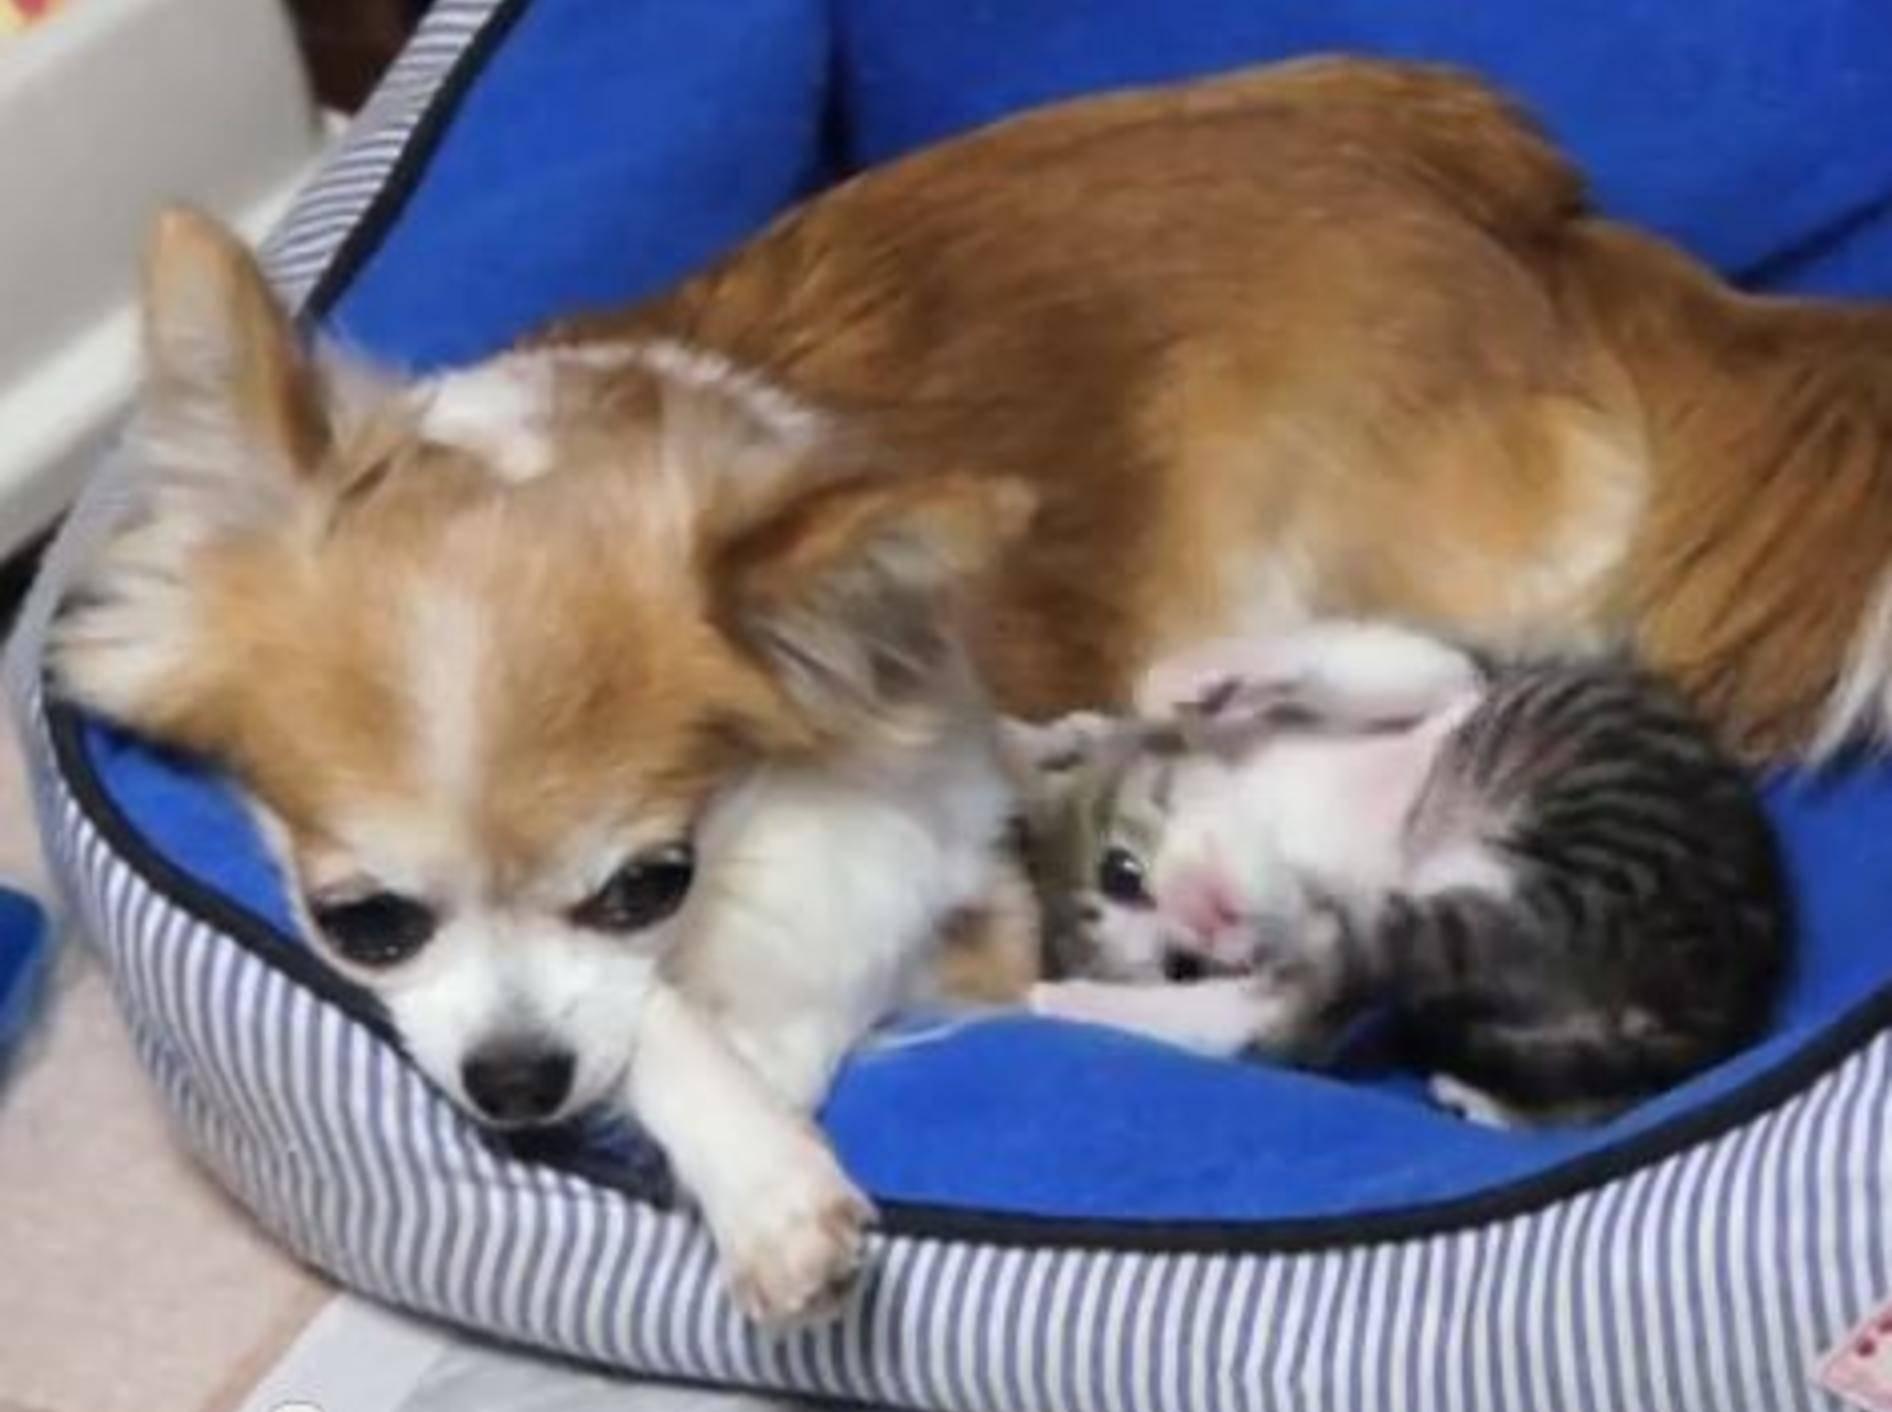 Ohagi und der Chihuahua: Wo die Liebe hinfällt — Bild: Youtube / MAKO0MAKO0